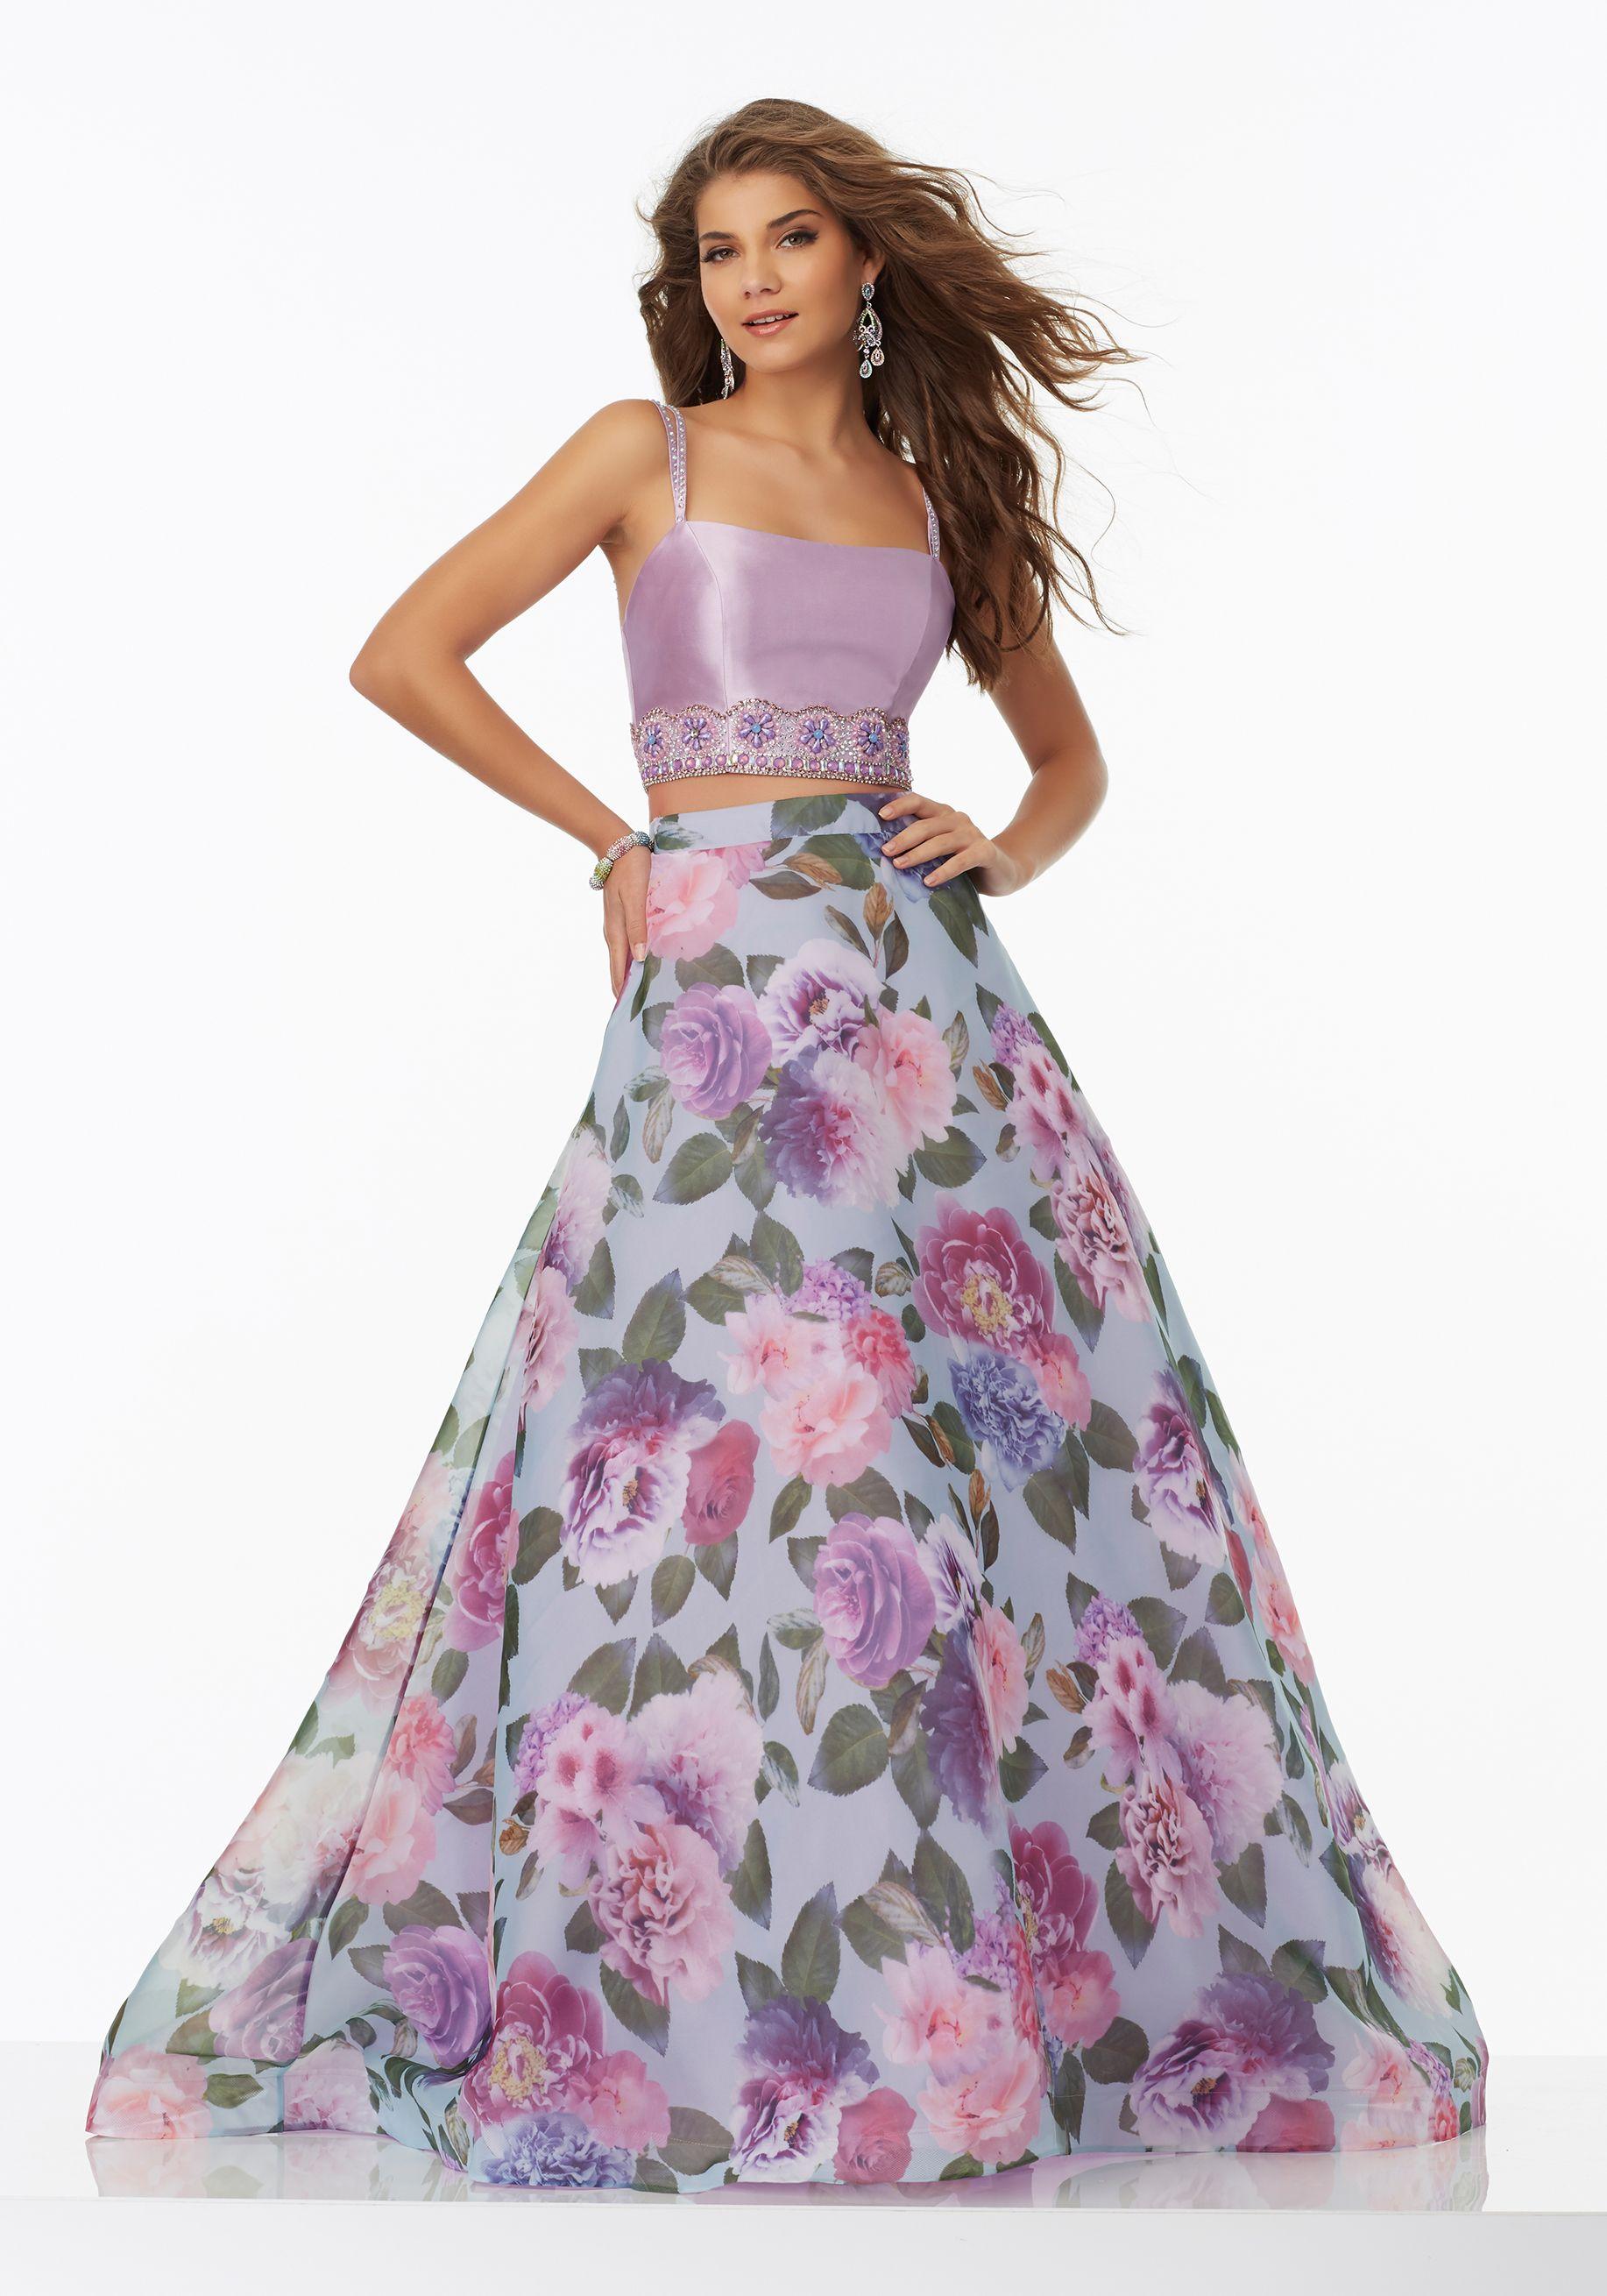 prom dressesmorilee style 99037 size 2. two-piece prom dress